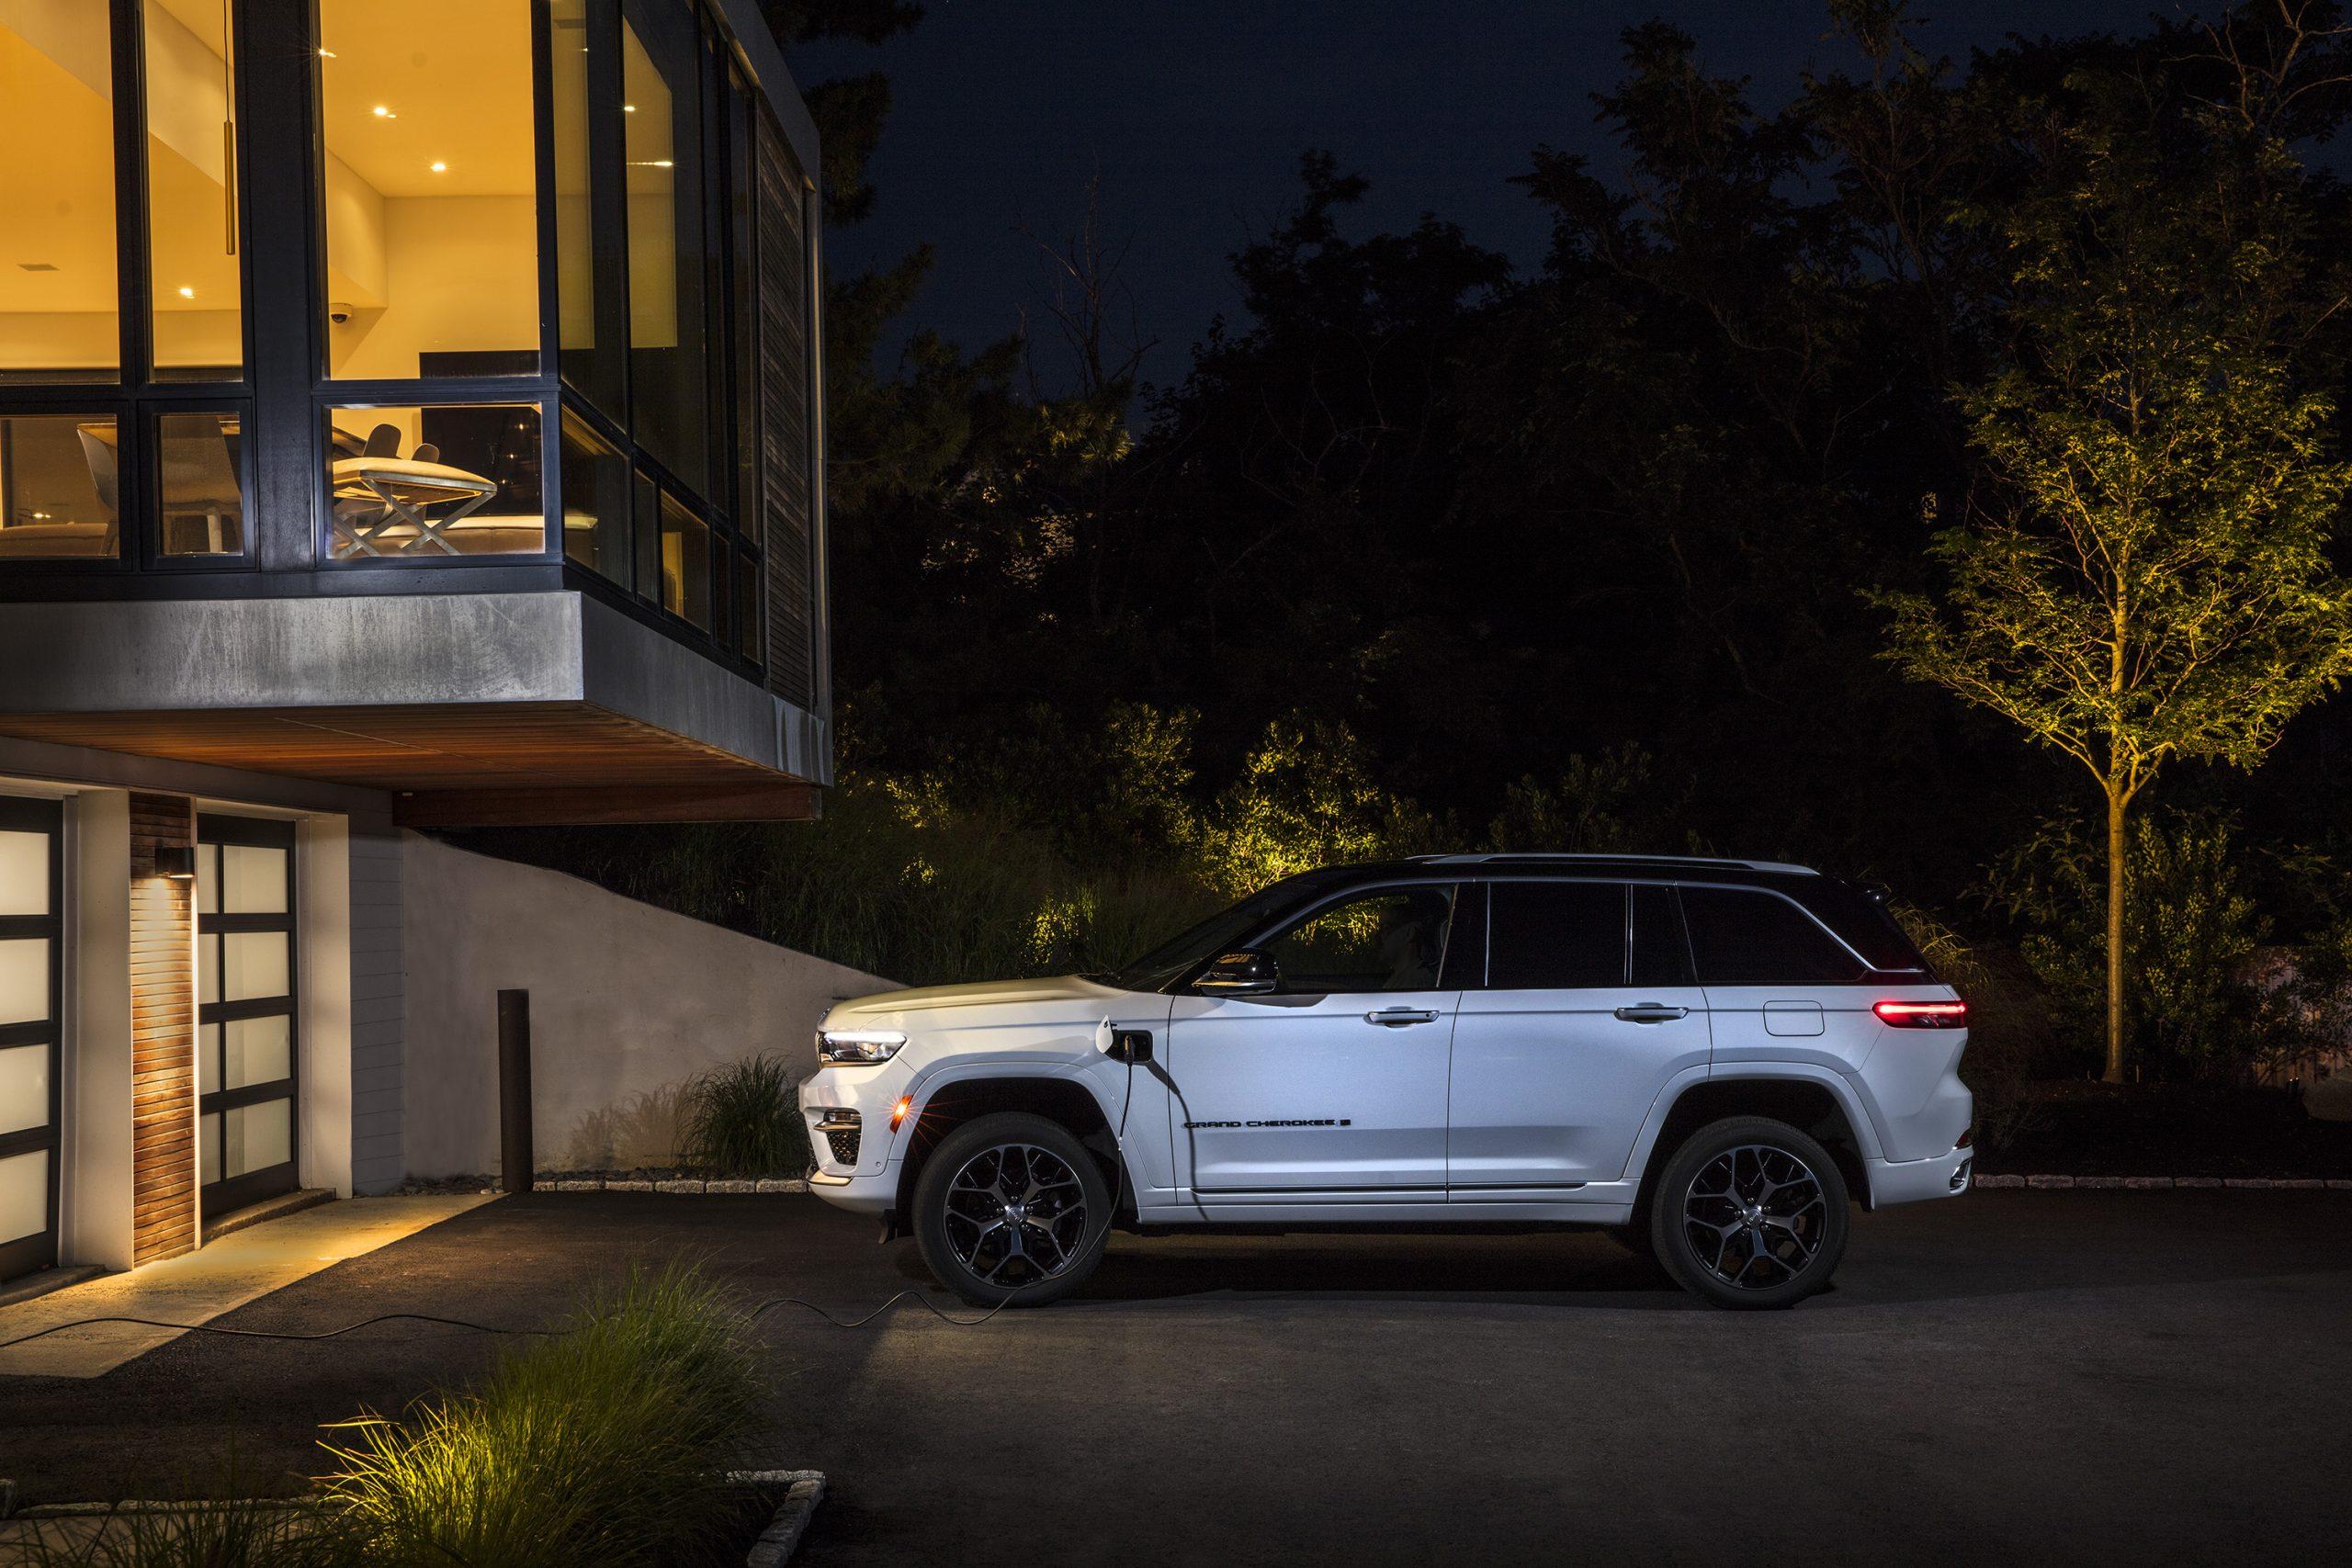 2022 Jeep Grand Cherokee Summit 4xe plugged in